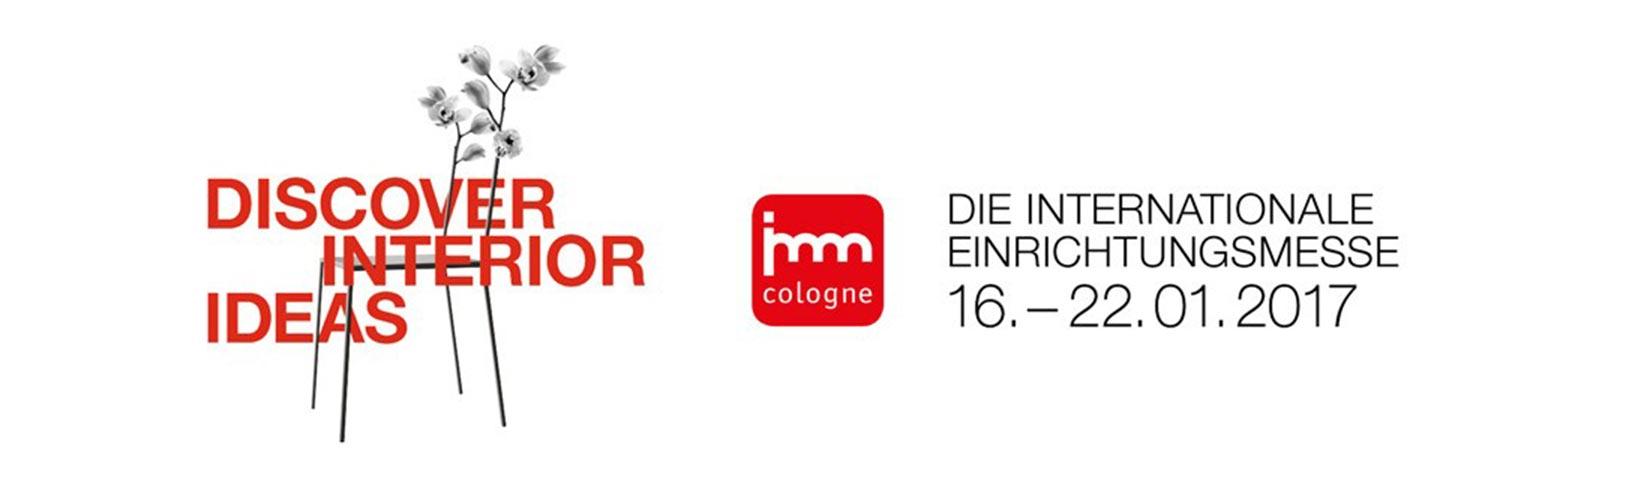 imm Cologne 2017